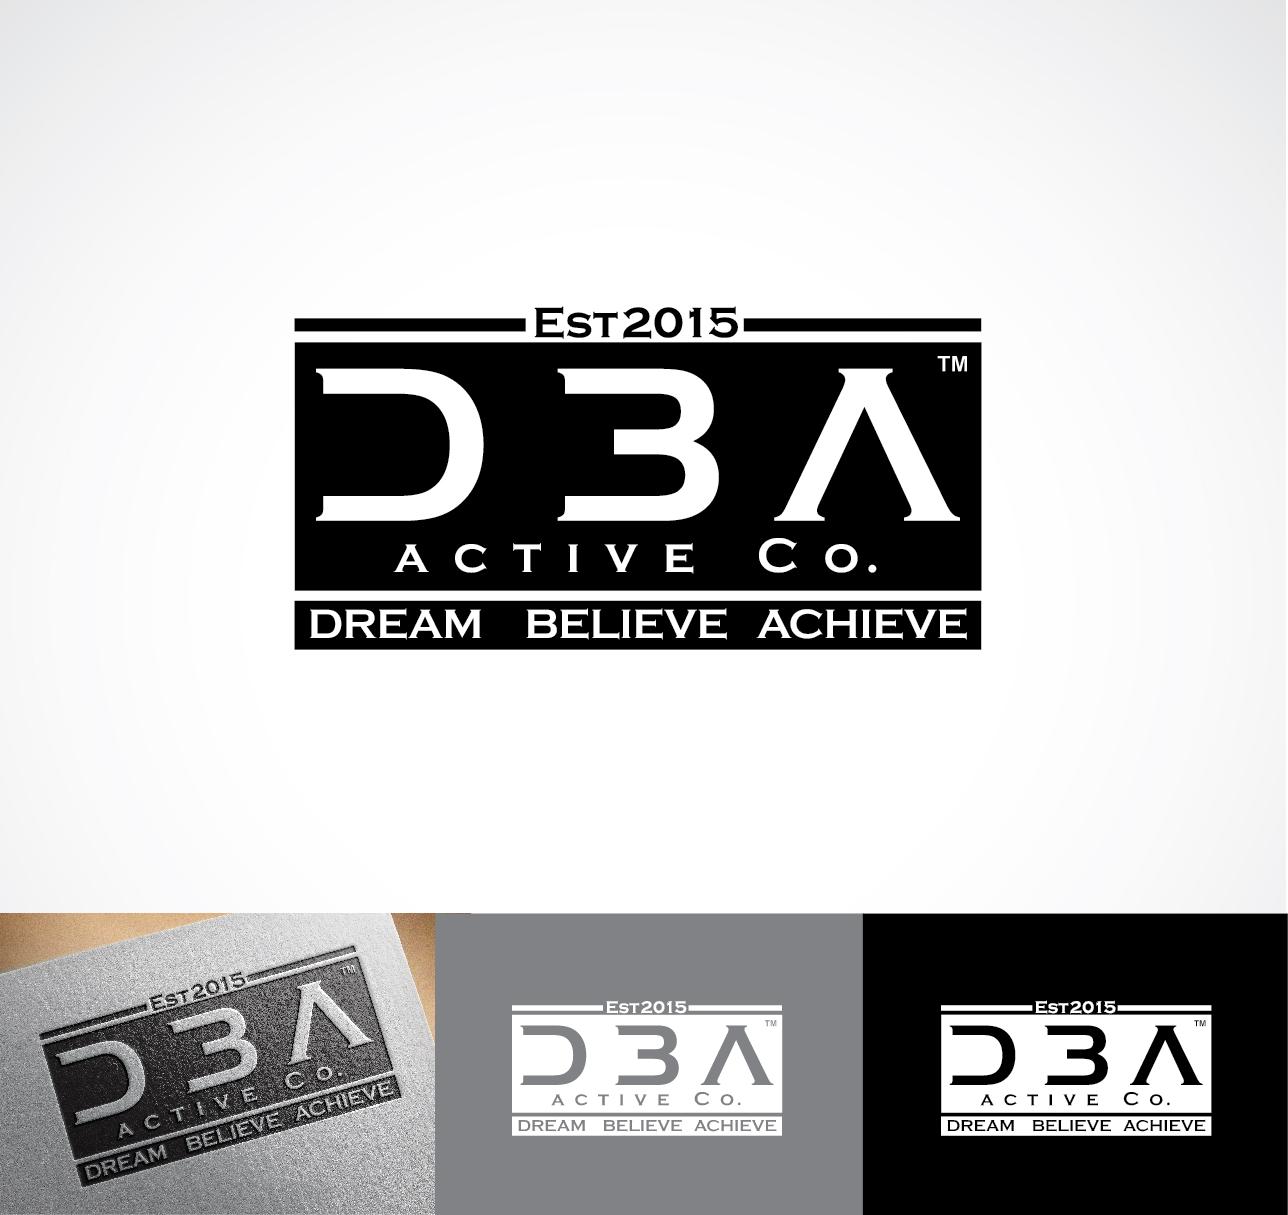 elegant professional clothing logo design for dba active co est2015 dream believe achieve by. Black Bedroom Furniture Sets. Home Design Ideas